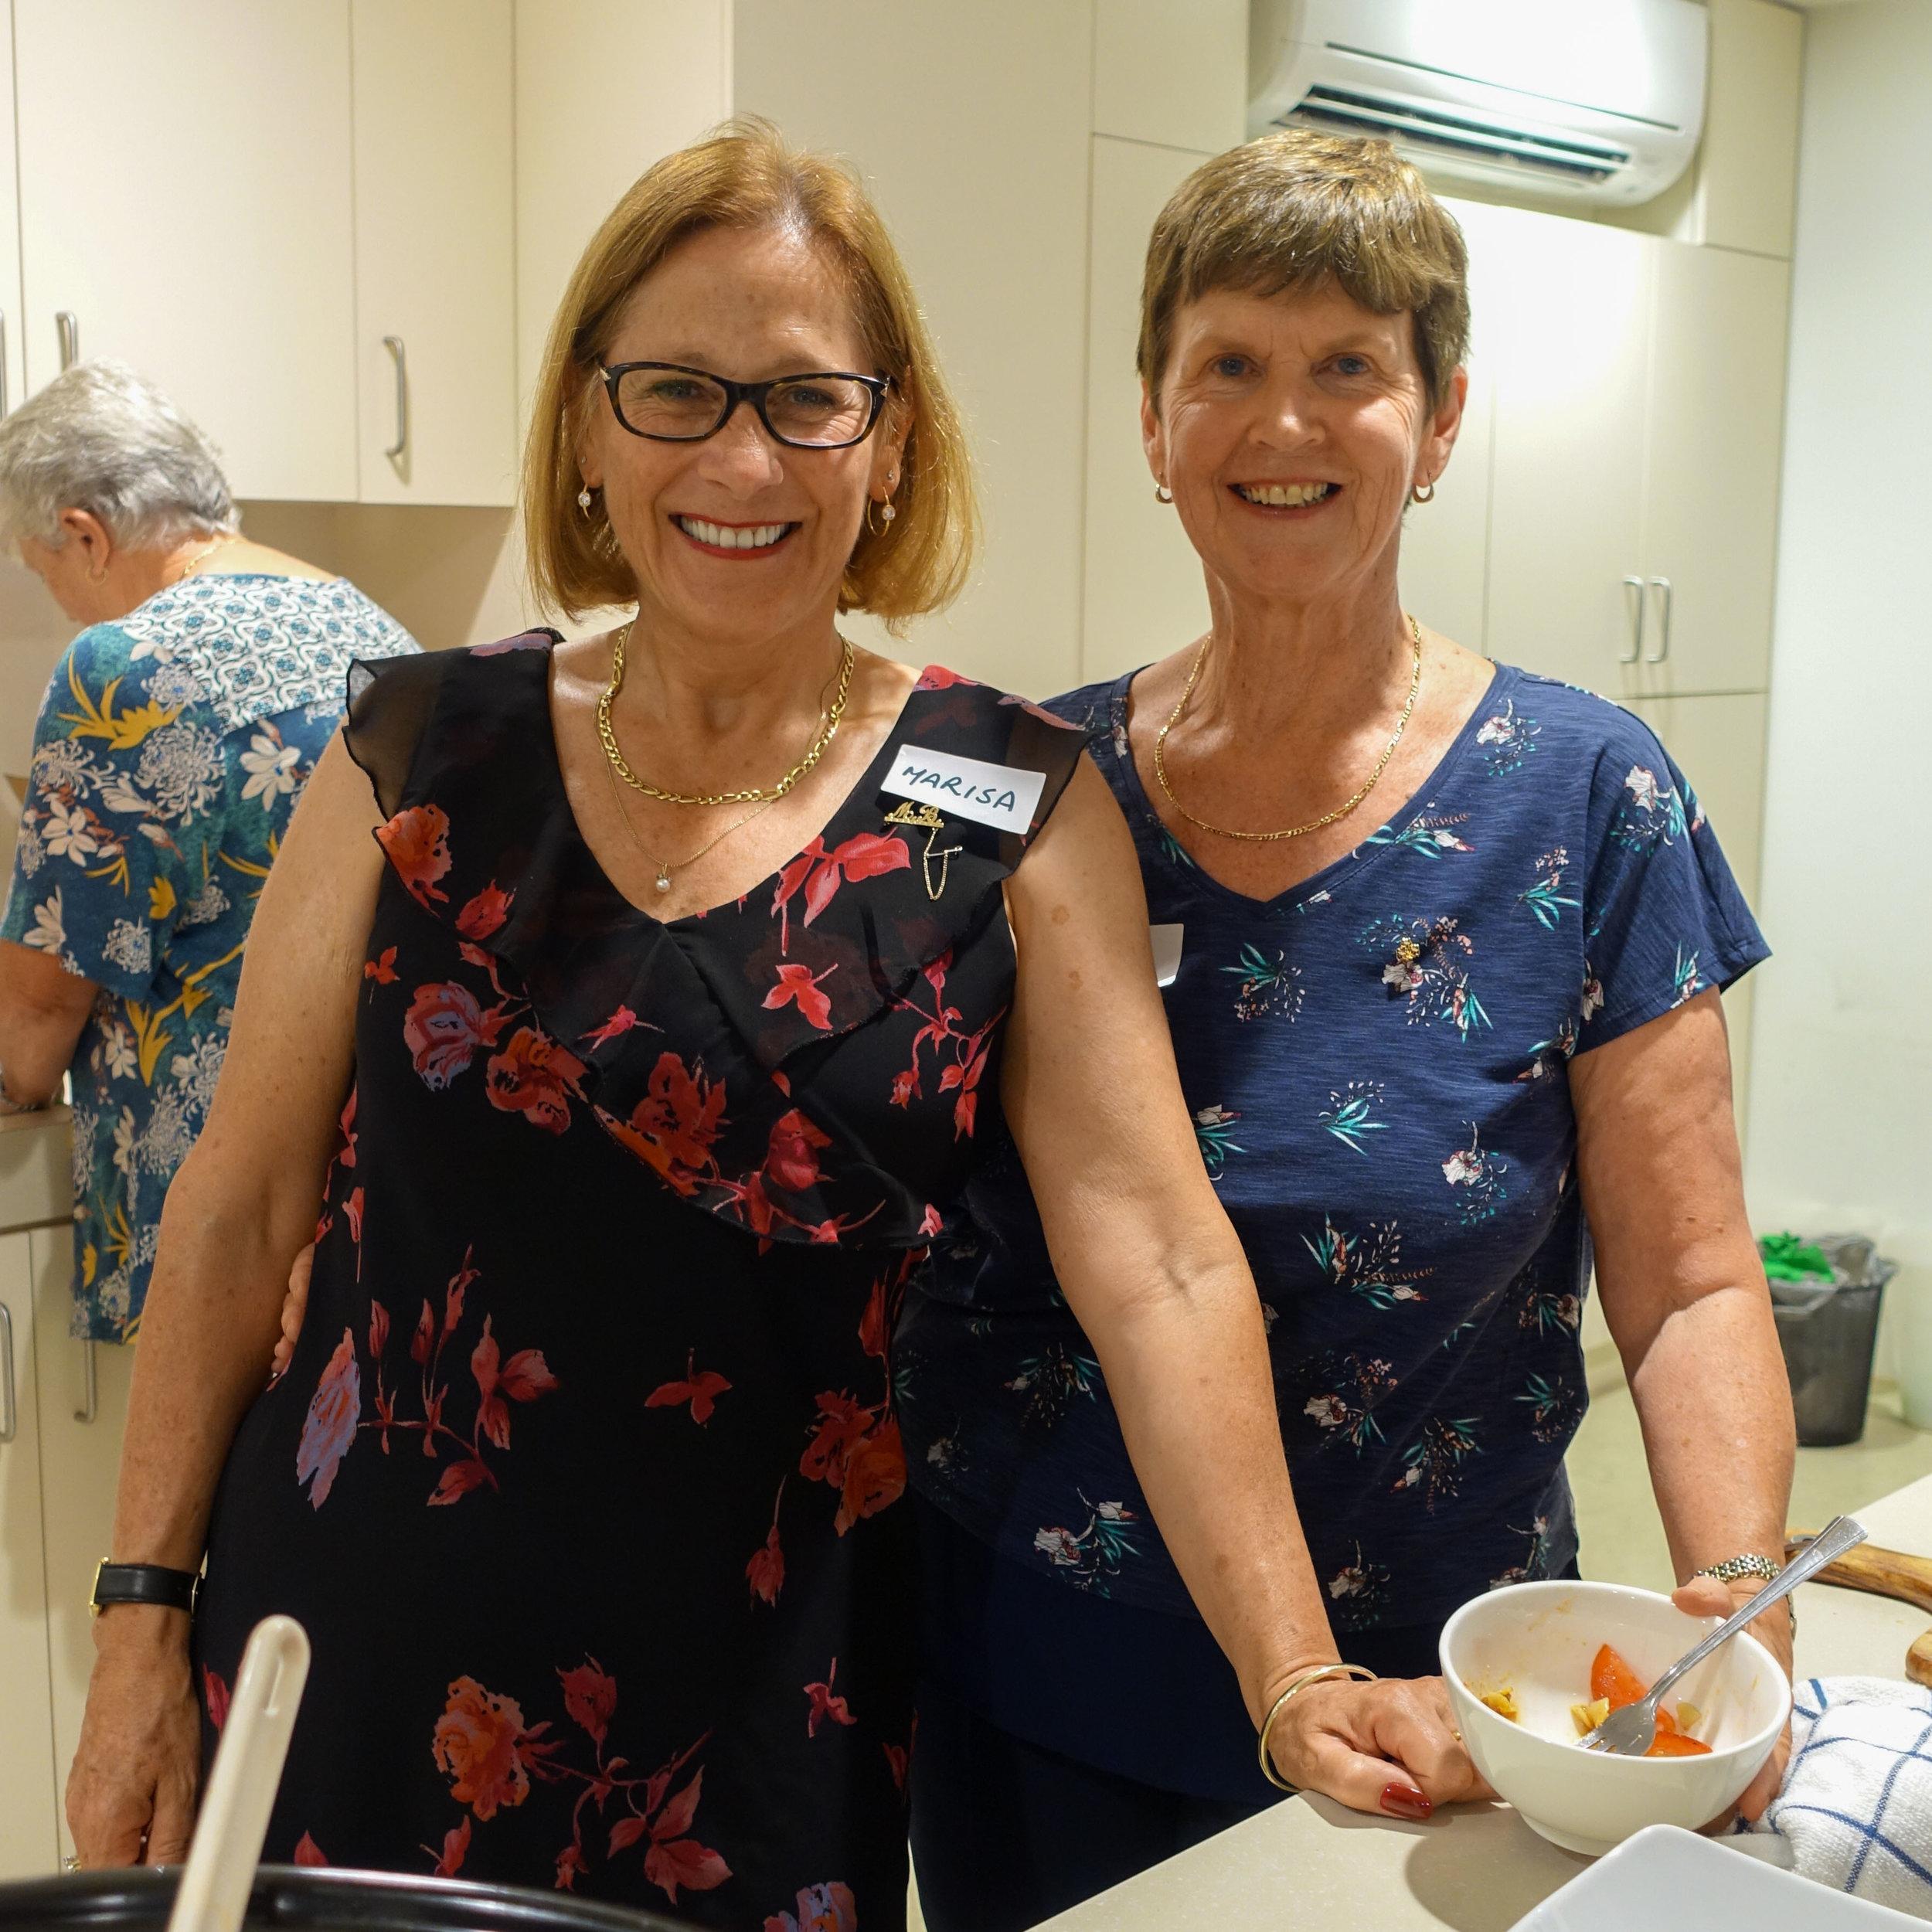 Marisa Bortolotto and Gail Coates - good friends